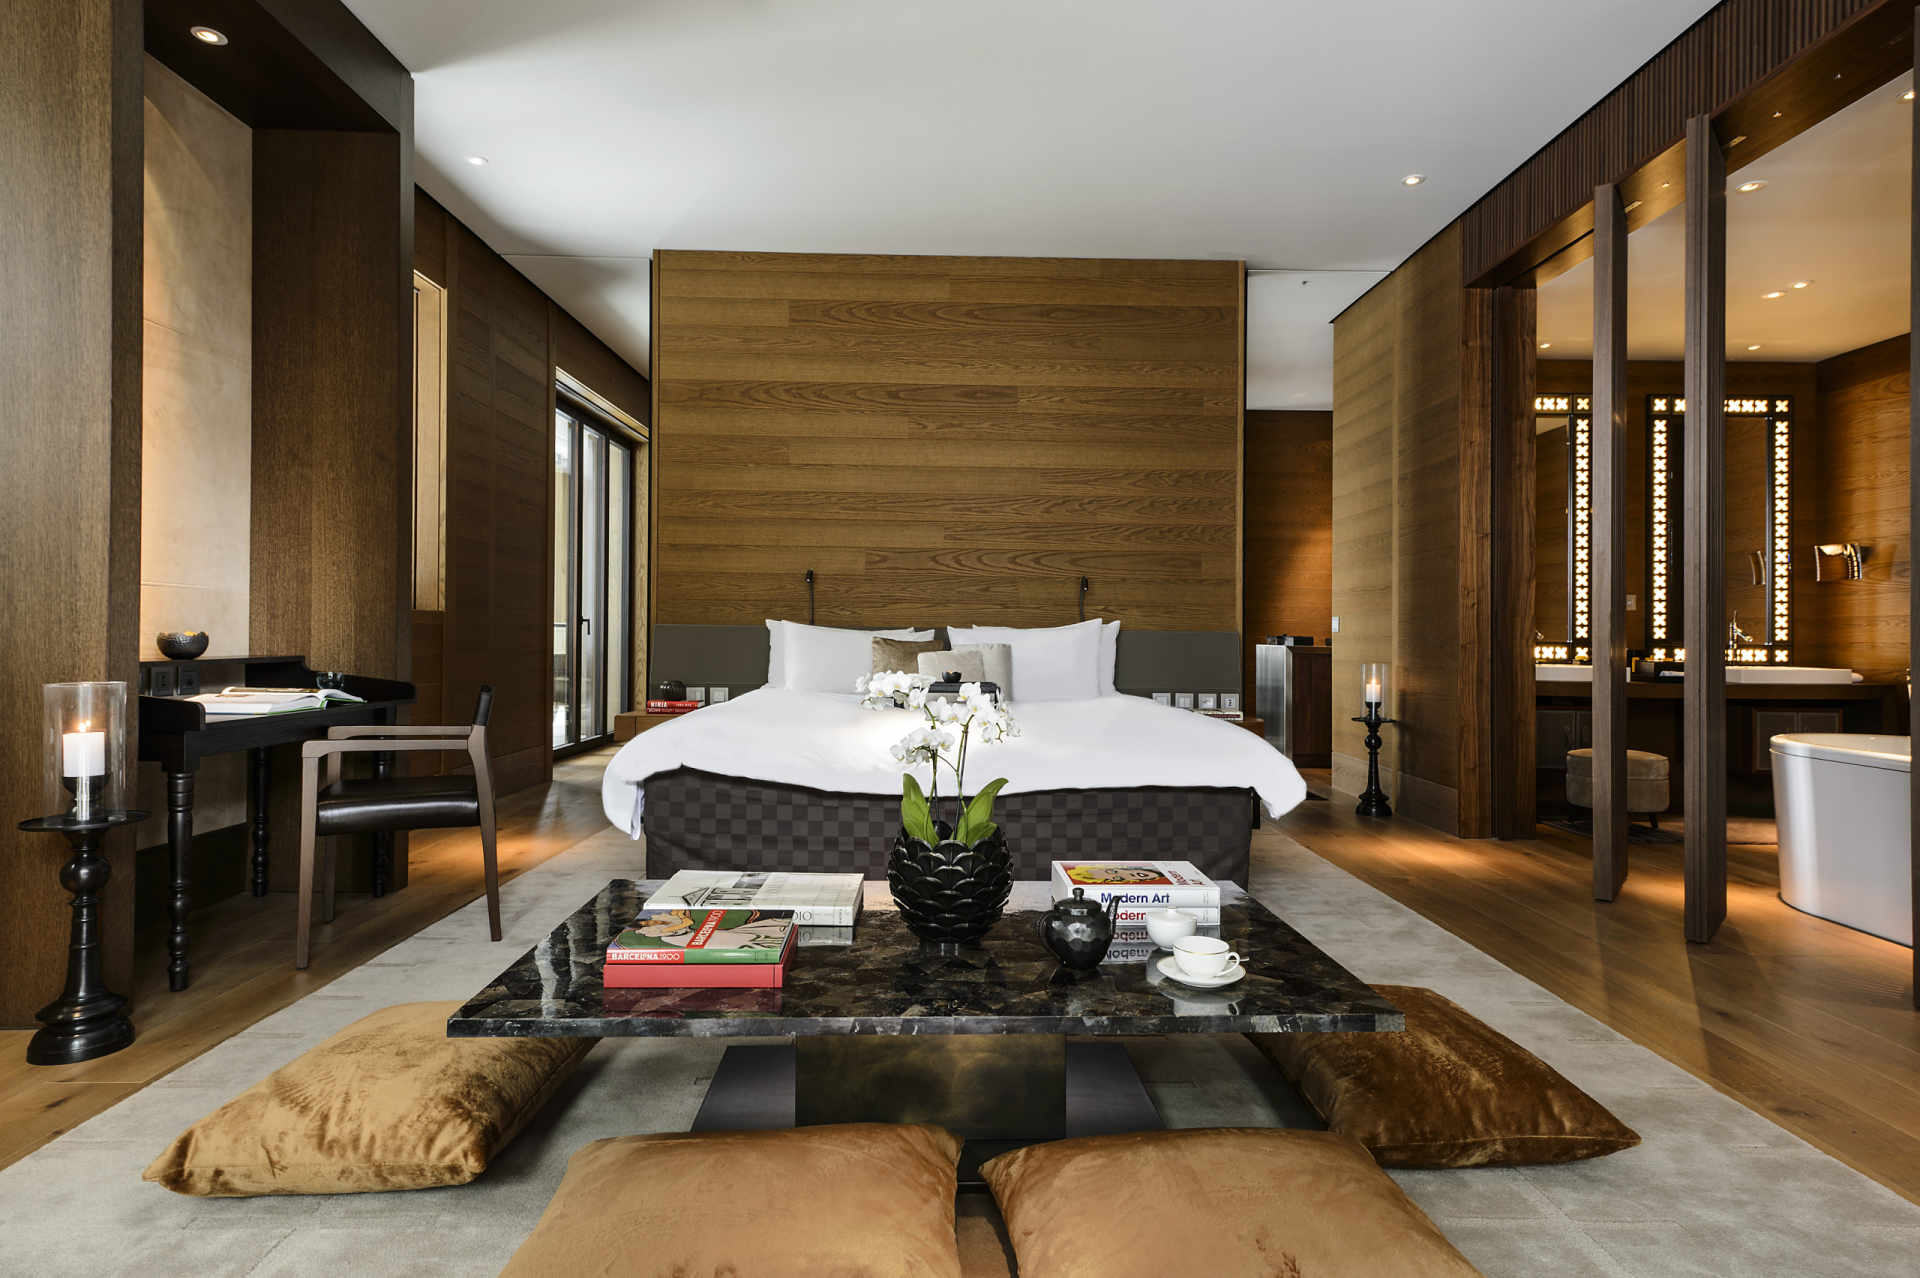 A_Unterkunft_The Chedi_Rooms-Grand Deluxe Suite-Bedroom_VL2018